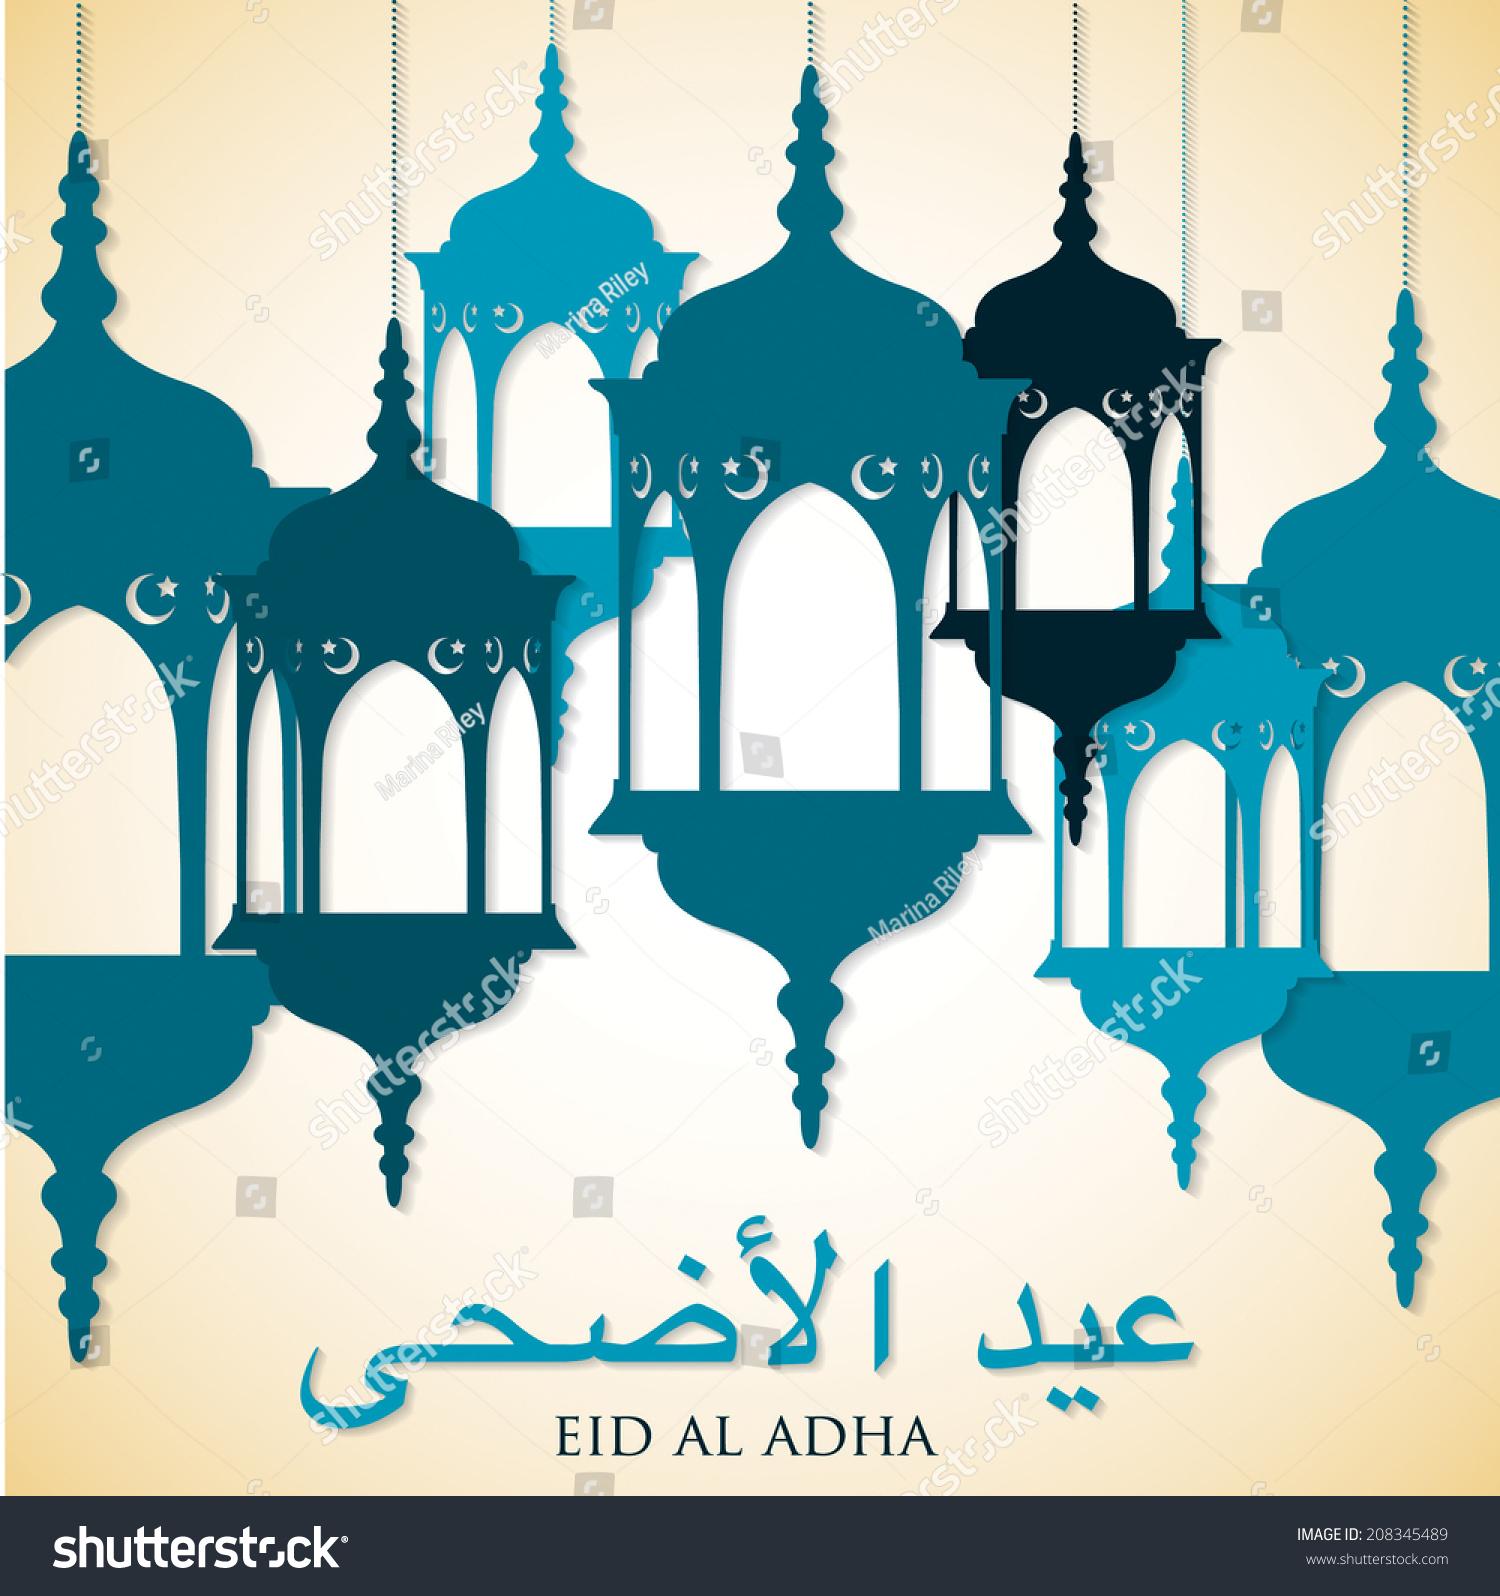 Eid al adha lantern card vector stock vector 208345489 shutterstock eid al adha lantern card in vector format stopboris Choice Image